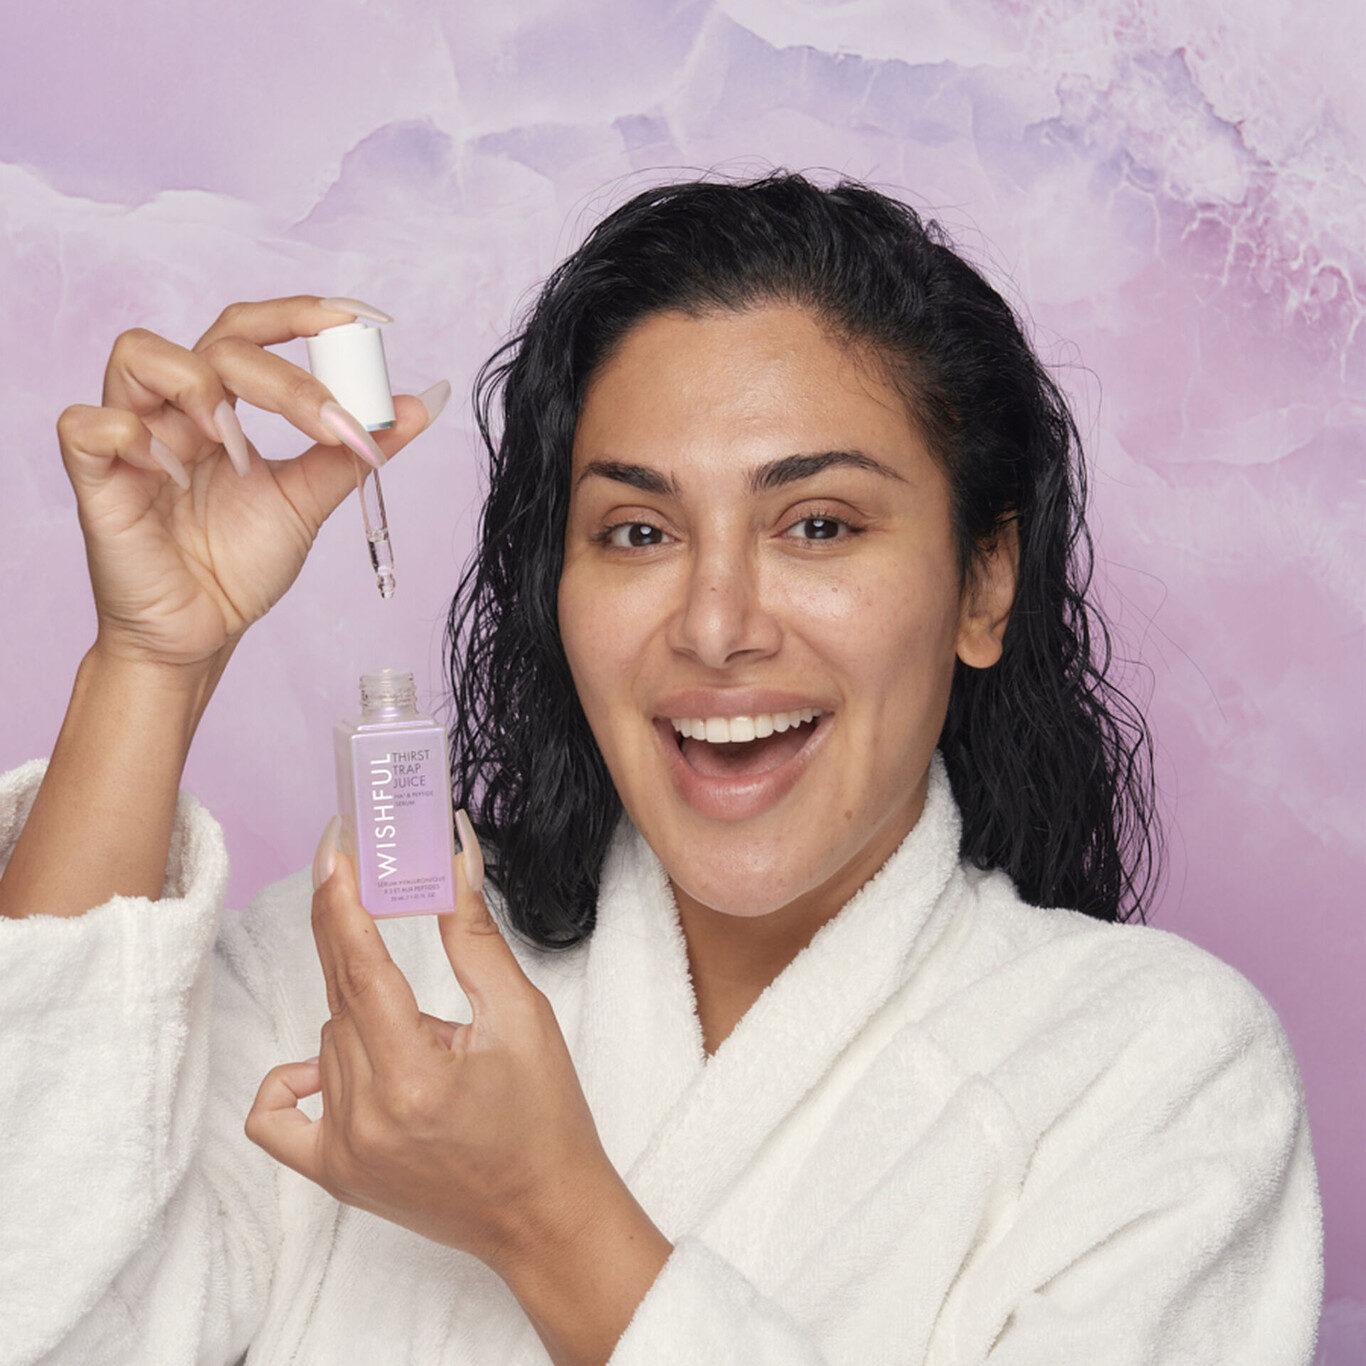 Wishful Skin Thirst Trap Juice HA3 Peptide Serum Huda Promo